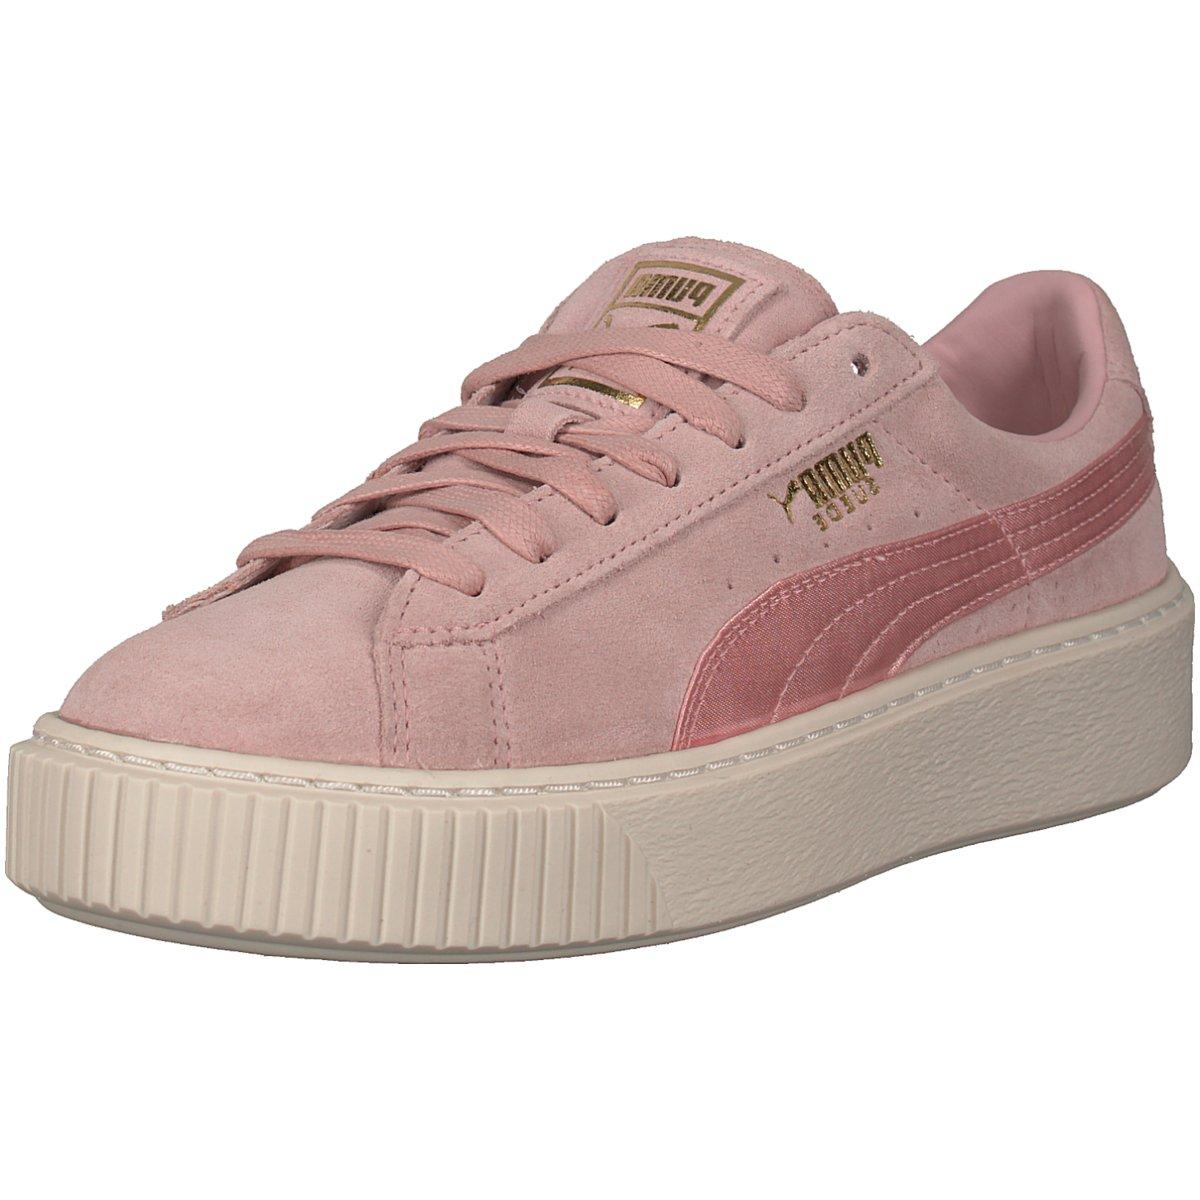 Details zu #S2K Puma Damen Sneaker Suede Platform Satin Sneaker 365828-003  rosa 301695